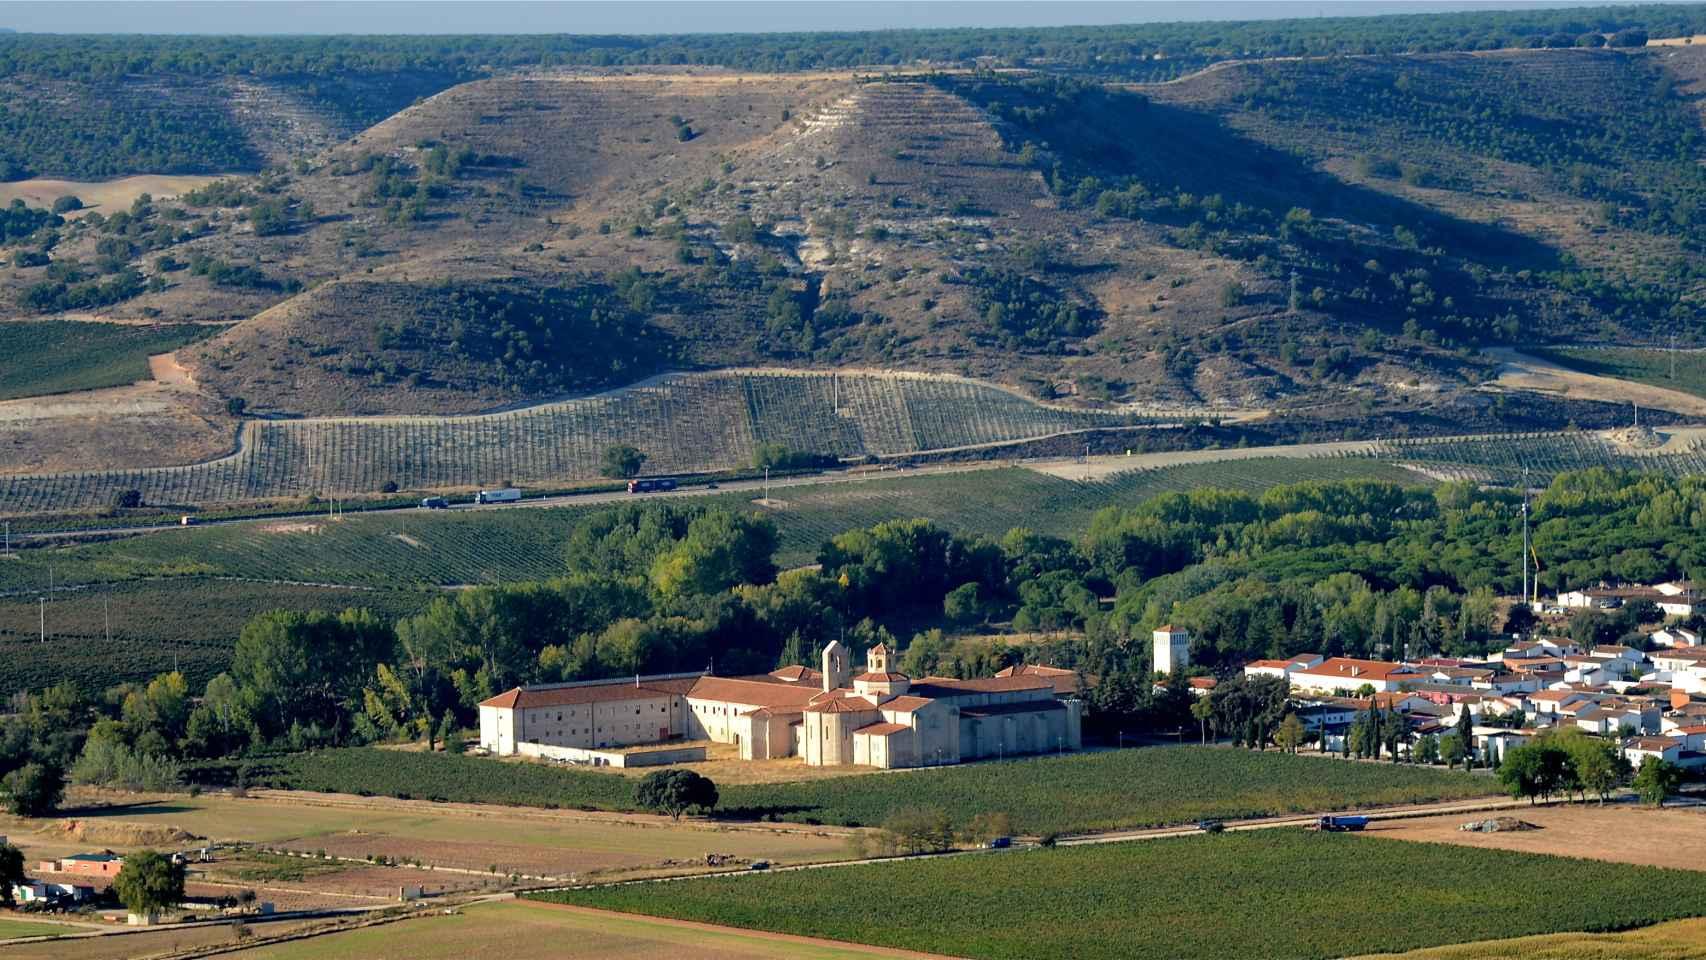 Monasterio de Valbuena.